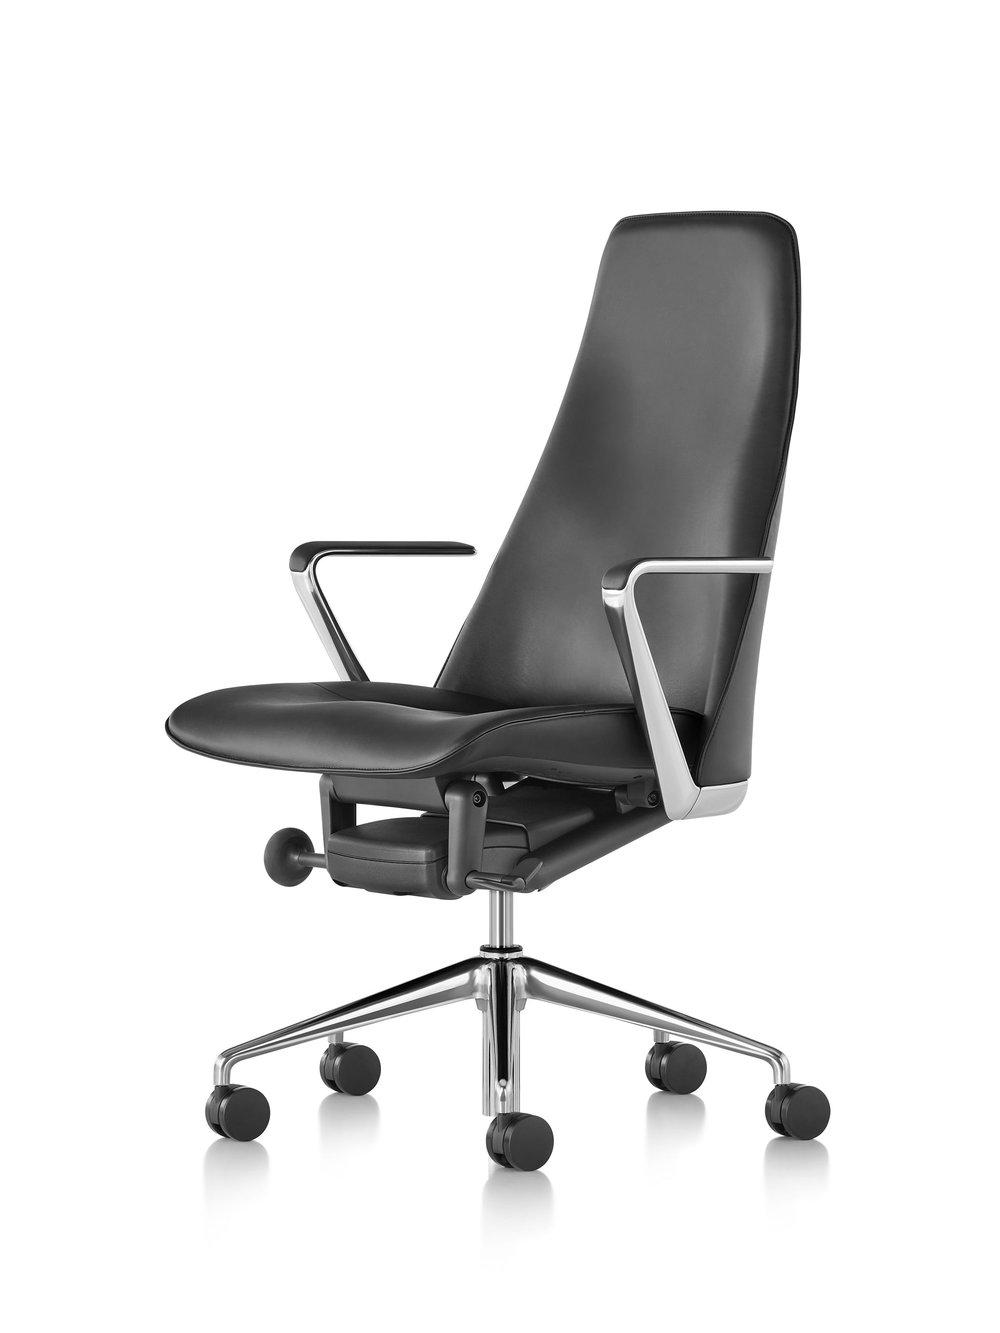 ig_prd_ovw_taper_chair_10.jpg